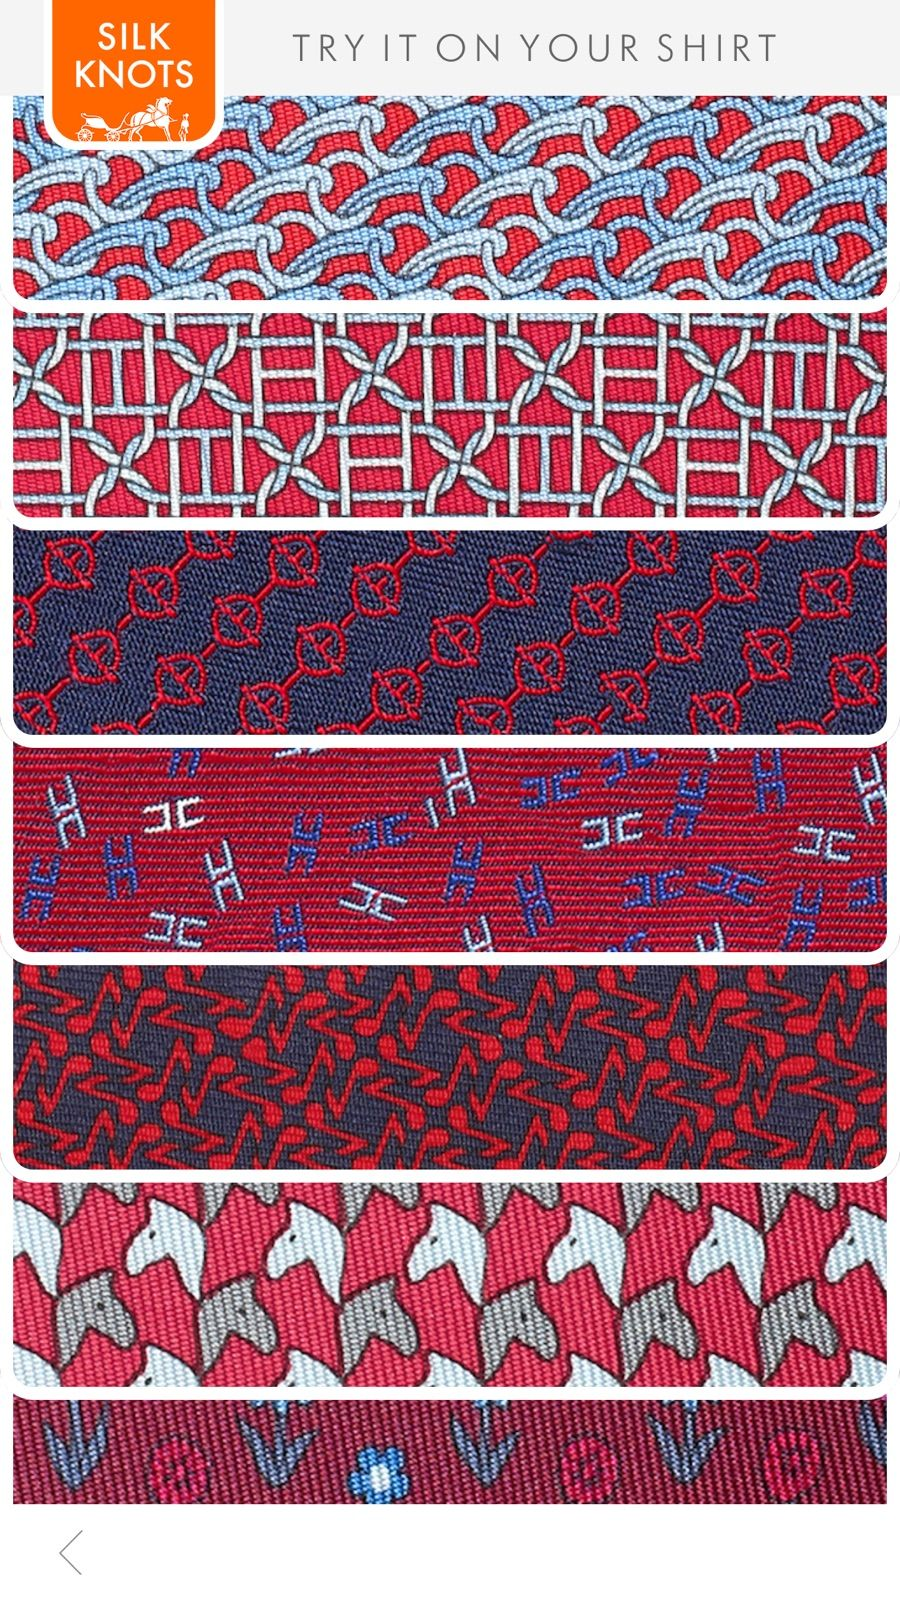 Hermès Silk Knots dans l'App Store